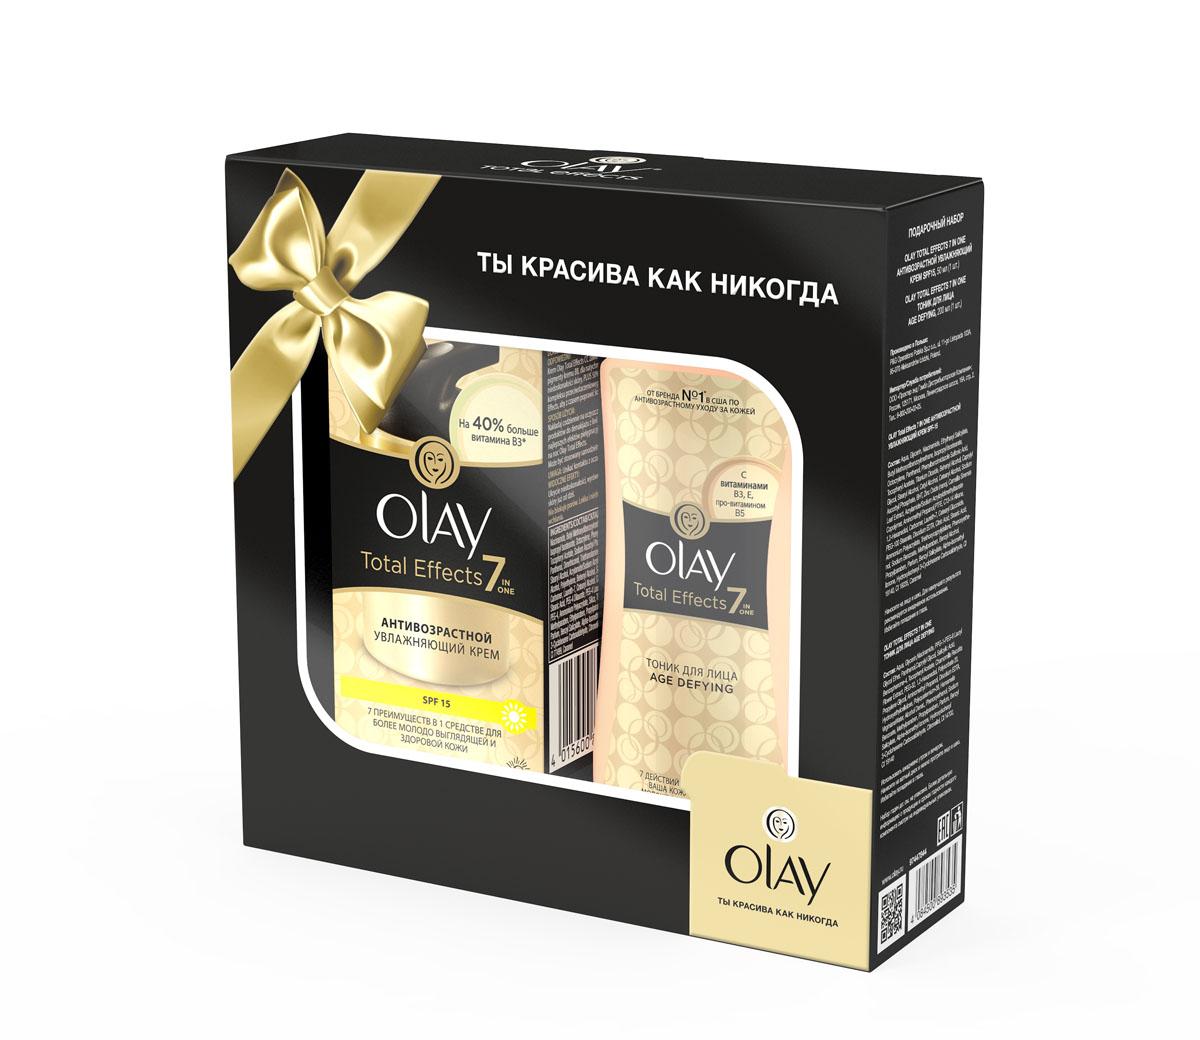 Olay Total Effects Подарочный набор антивозрастной увлажняющий крем SPF 15 (50 мл) + Olay Total Effects тоник для лица Age Defying (200 мл) (OLAY)